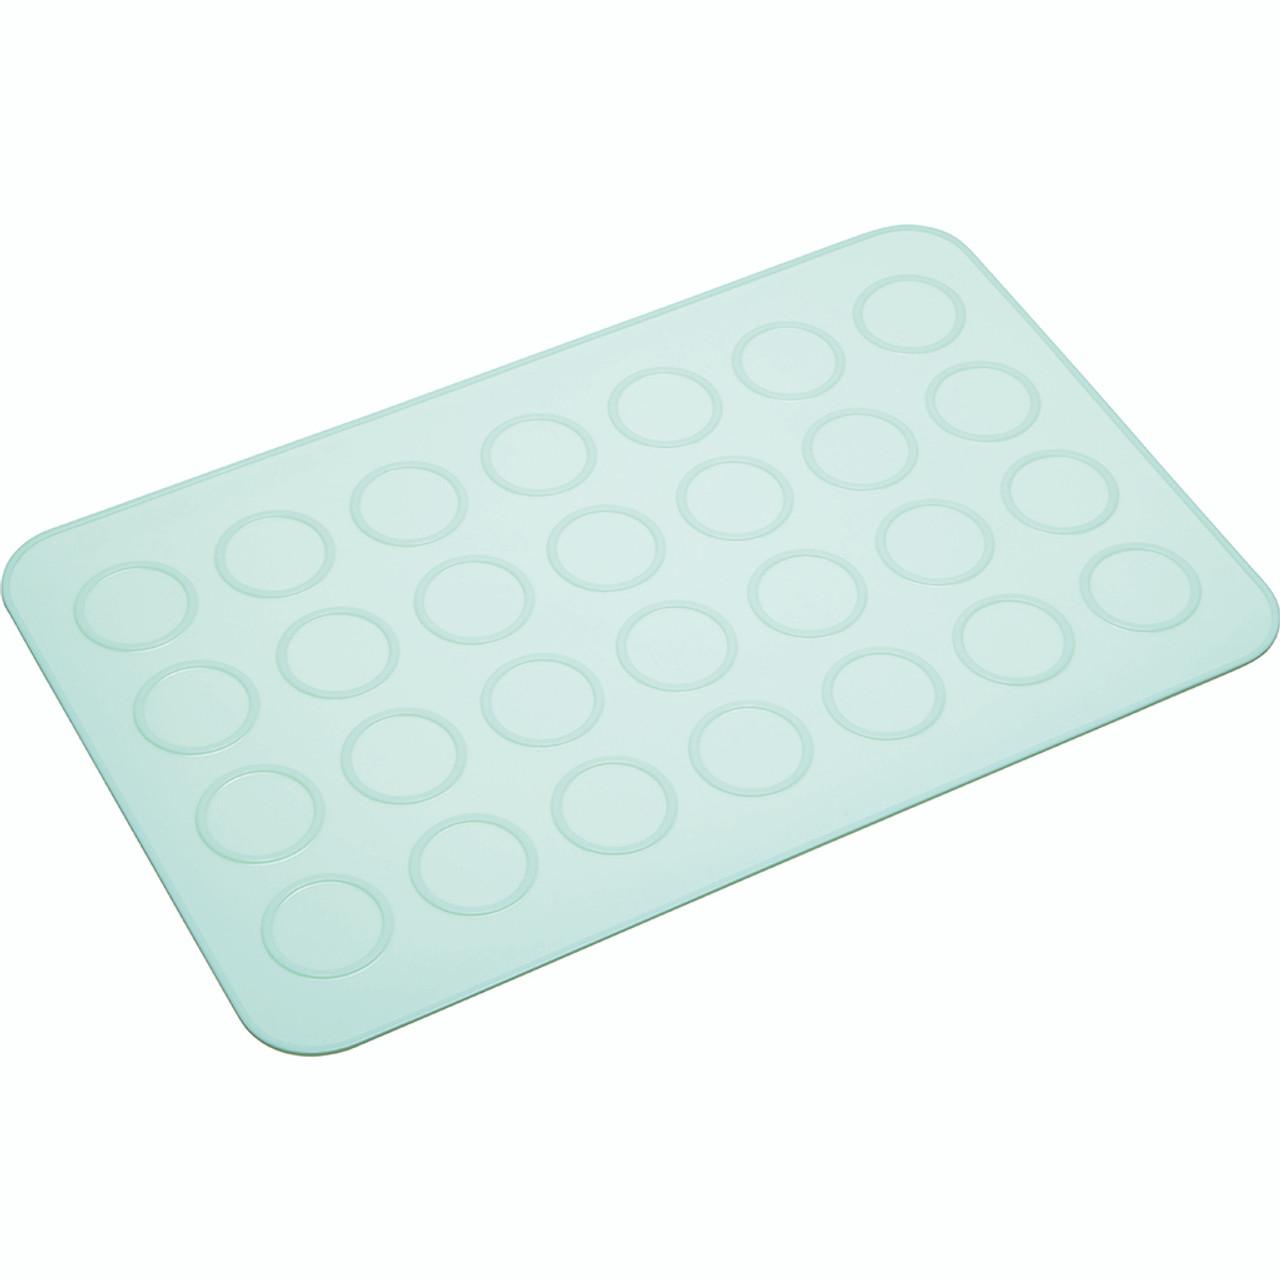 Silicon Mould - Macaroon Baking Sheet